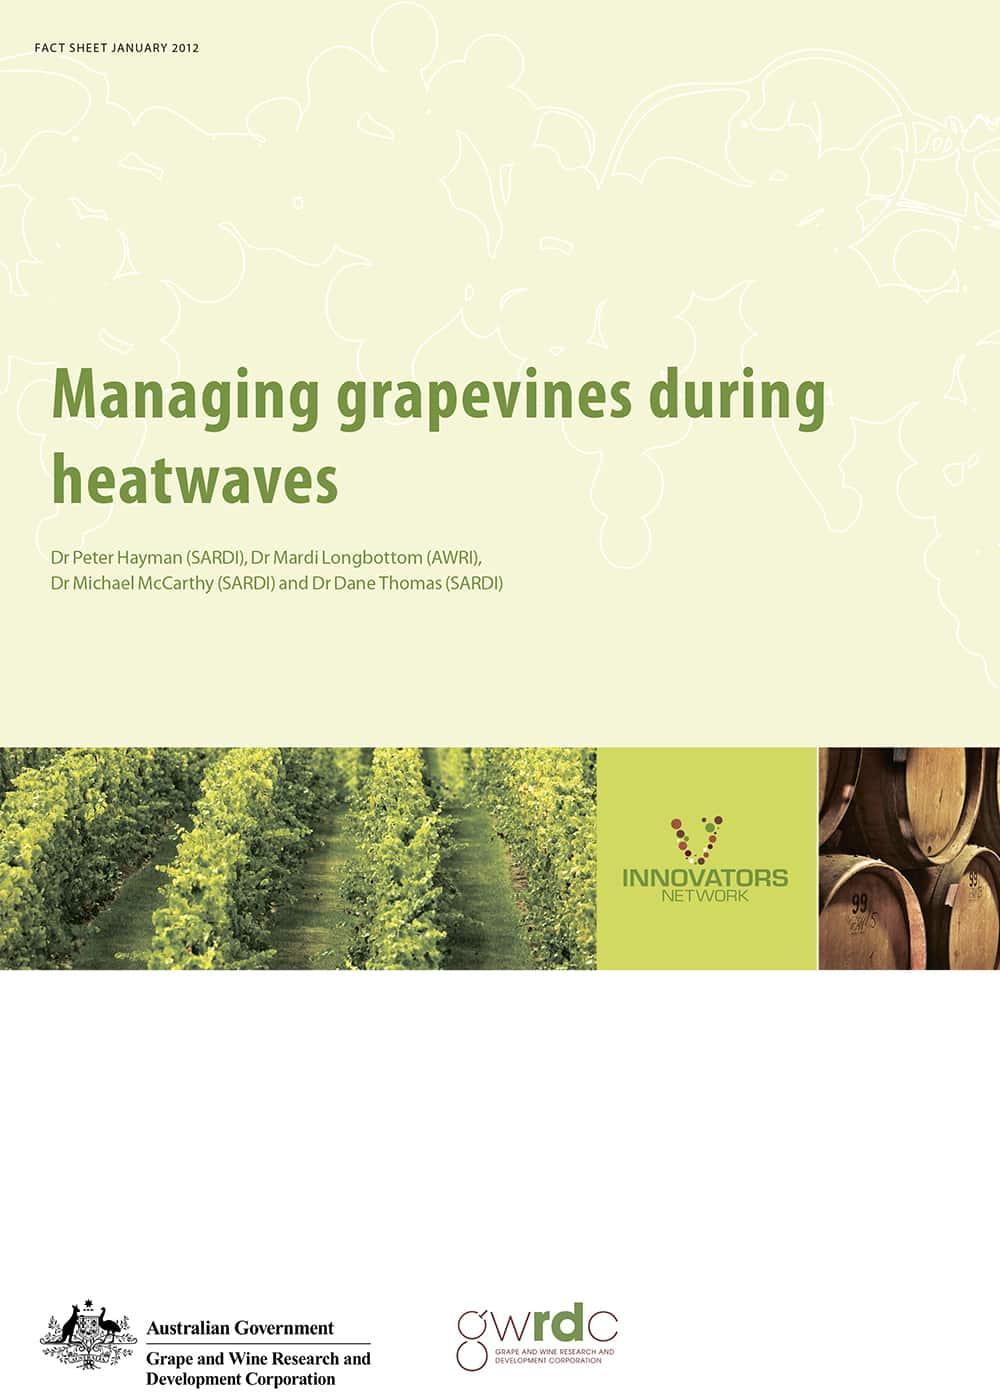 Managing grapevines during heatwaves